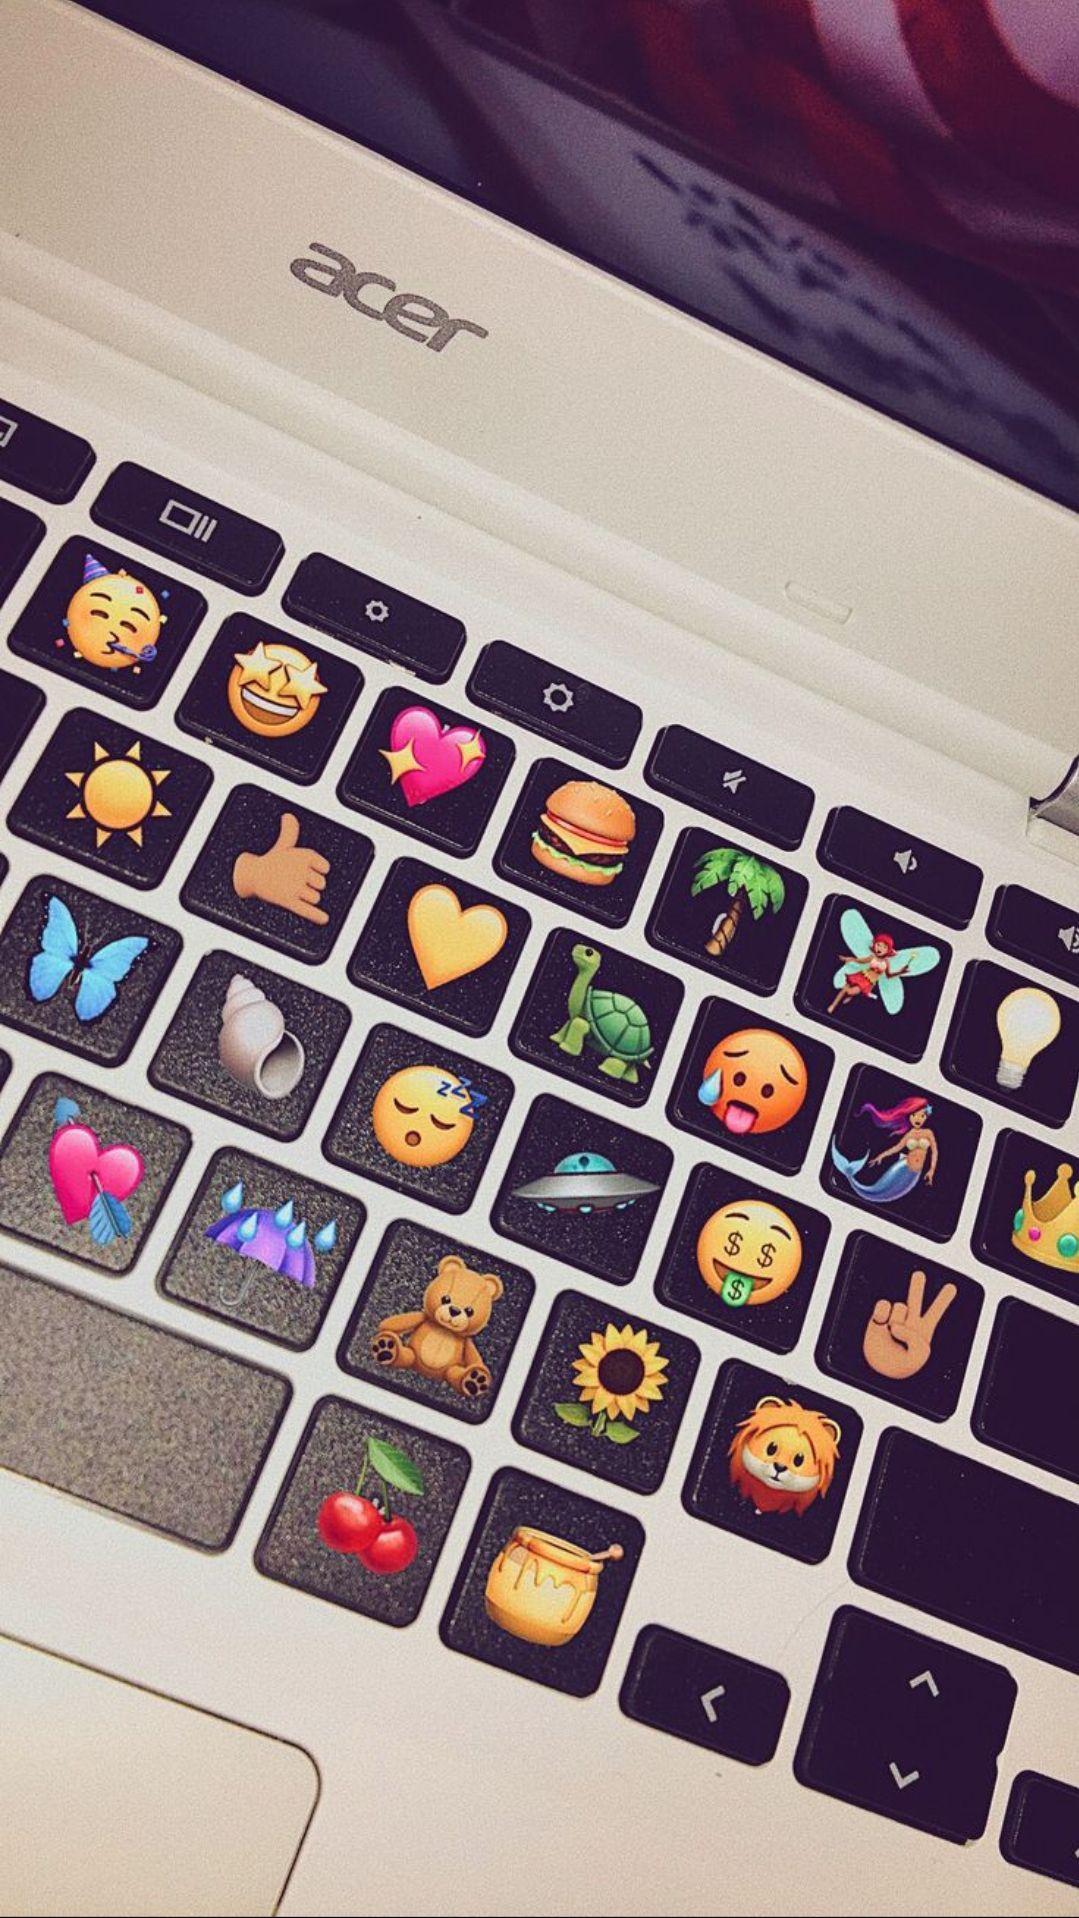 emoji by fira kirana on aesthetic emoji pictures emoji